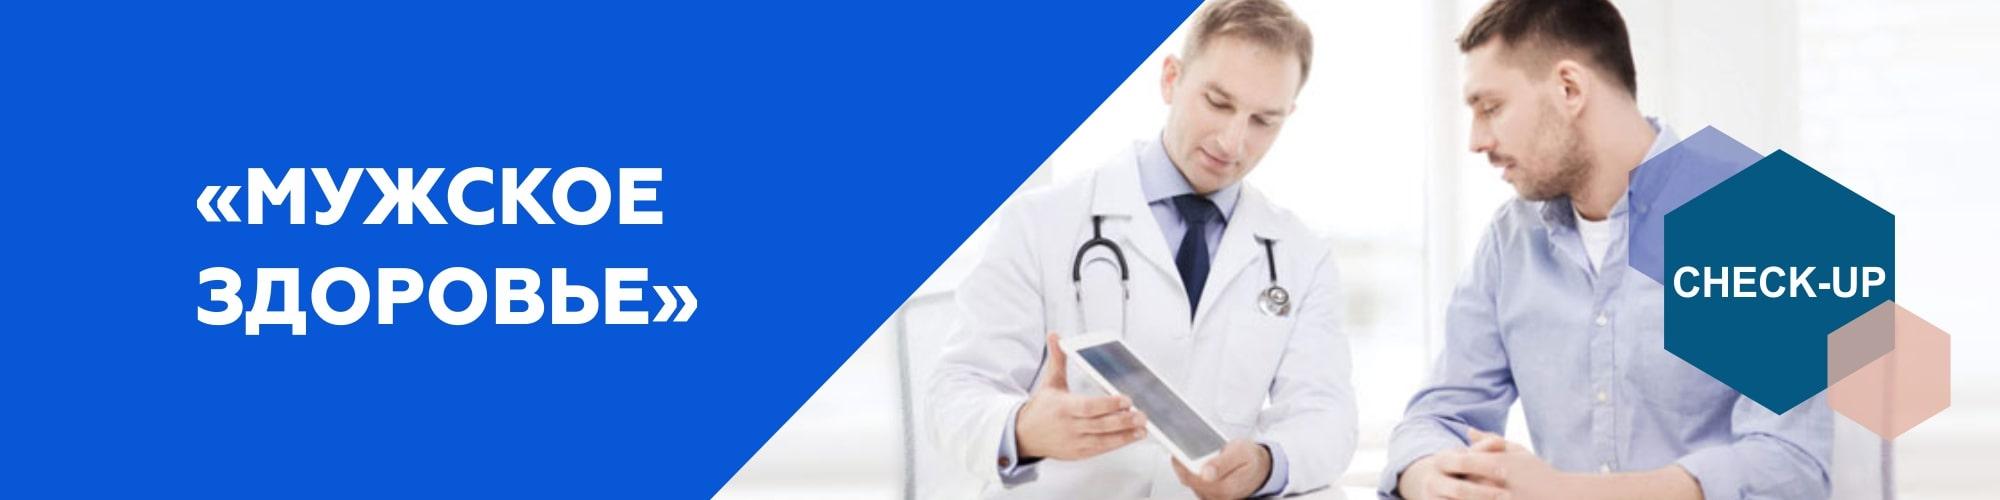 Check-up «Мужское здоровье»